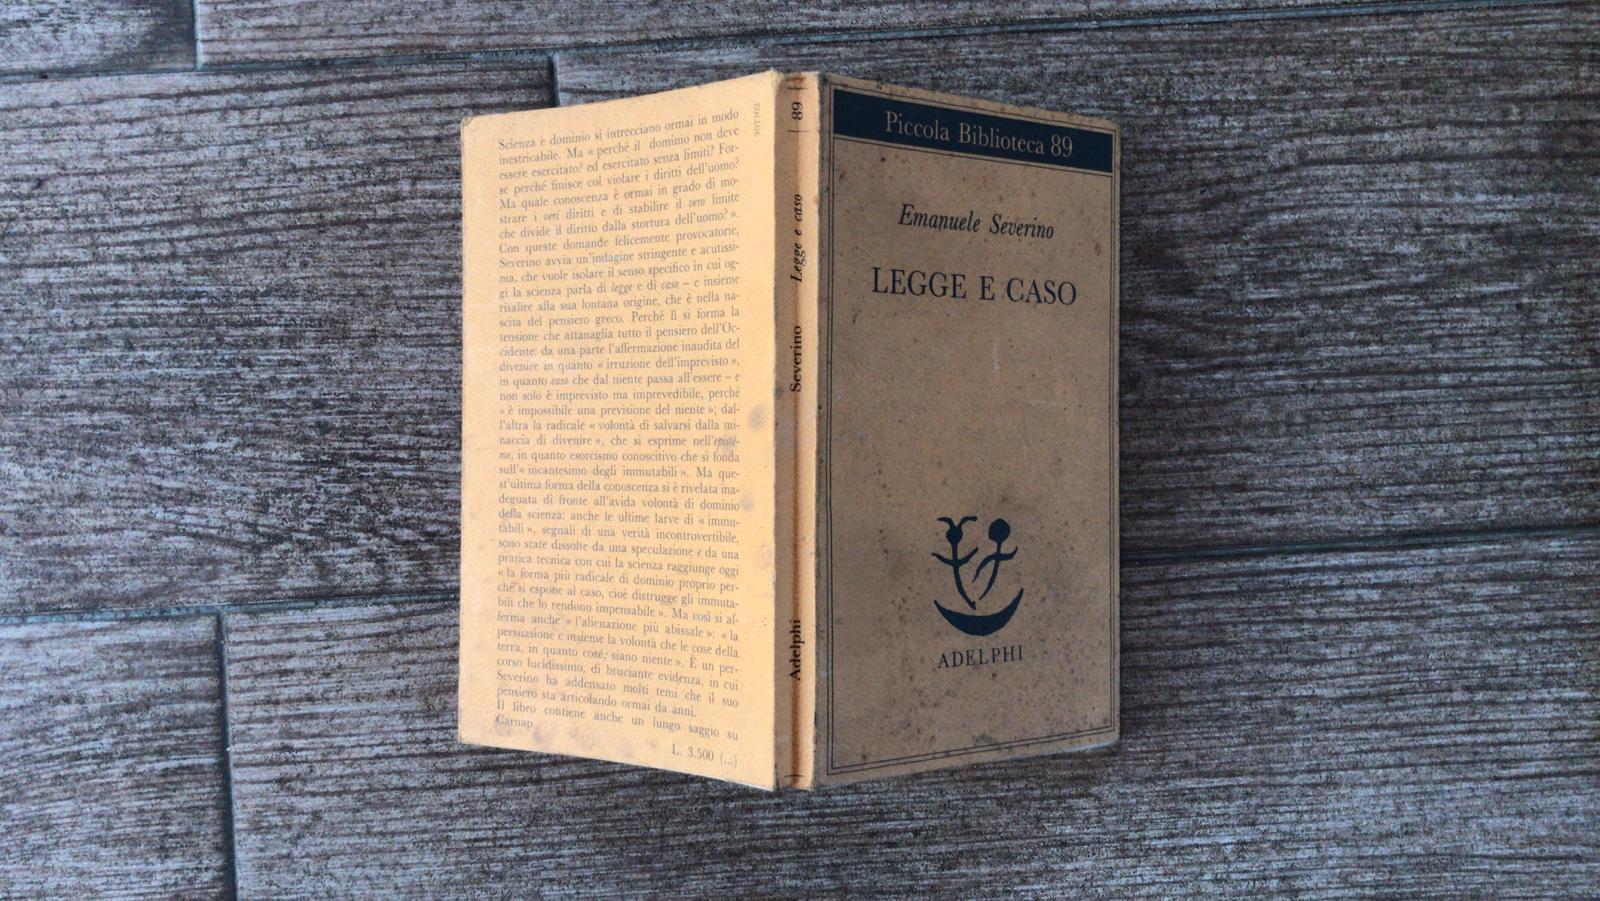 Legge e caso - Emanuele Severino